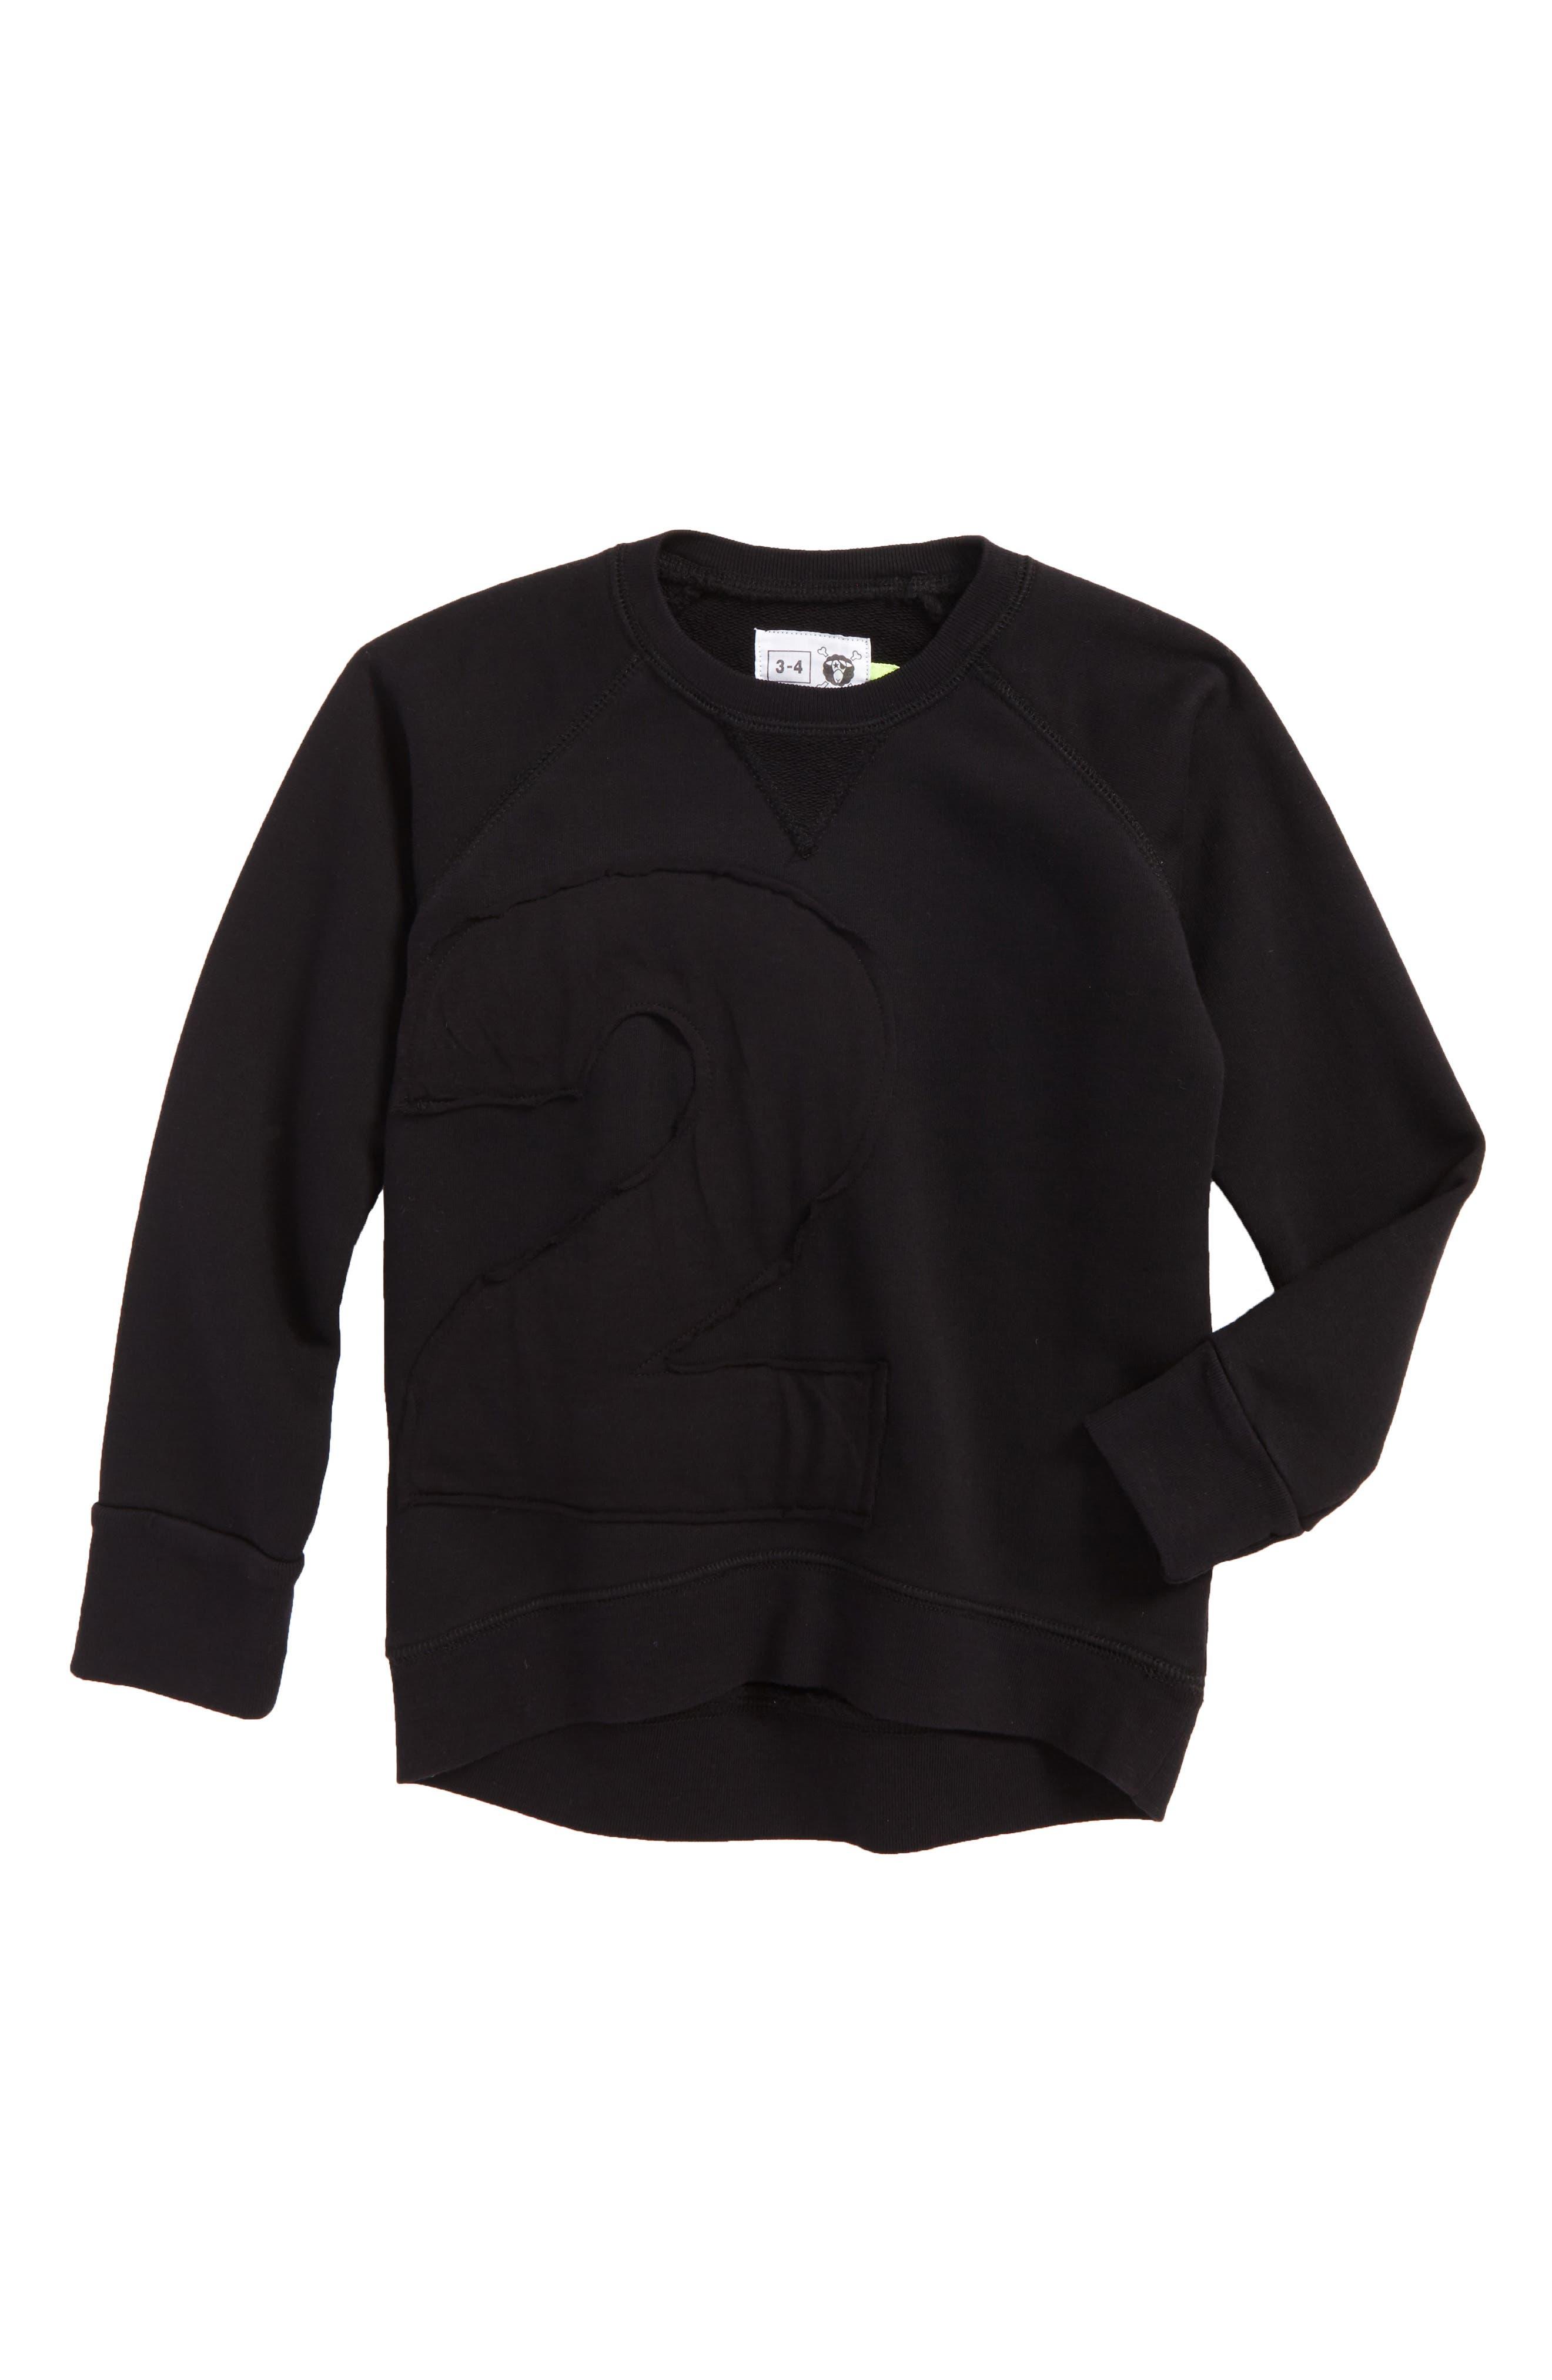 Puffy Number Sweatshirt,                             Main thumbnail 1, color,                             001